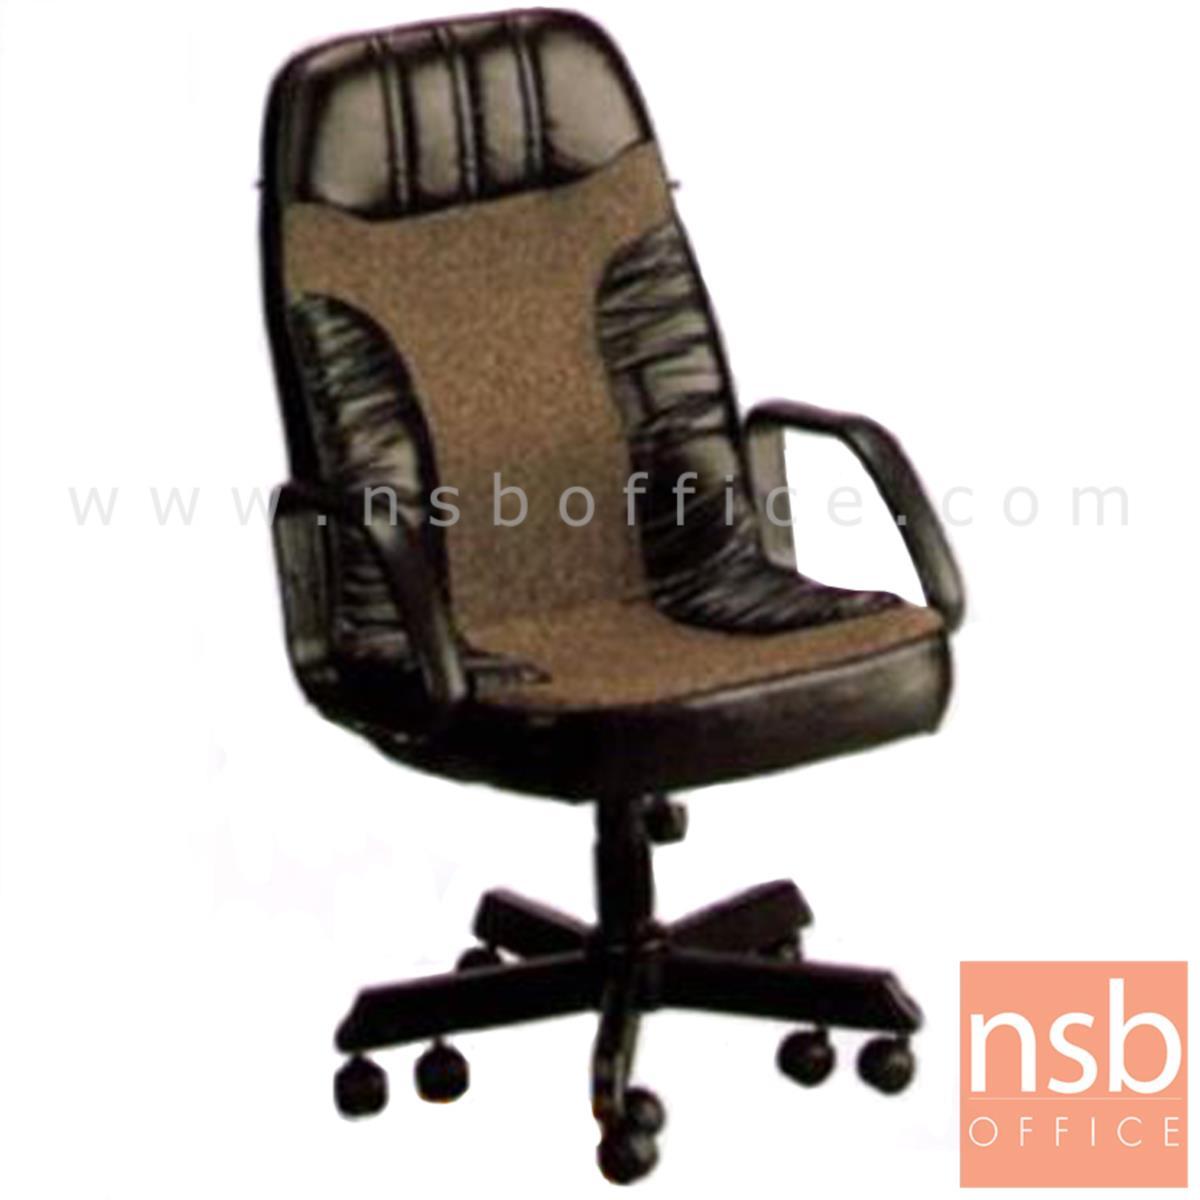 B14A013:เก้าอี้สำนักงาน รุ่น Destinies  ขาเหล็ก 10 ล้อ